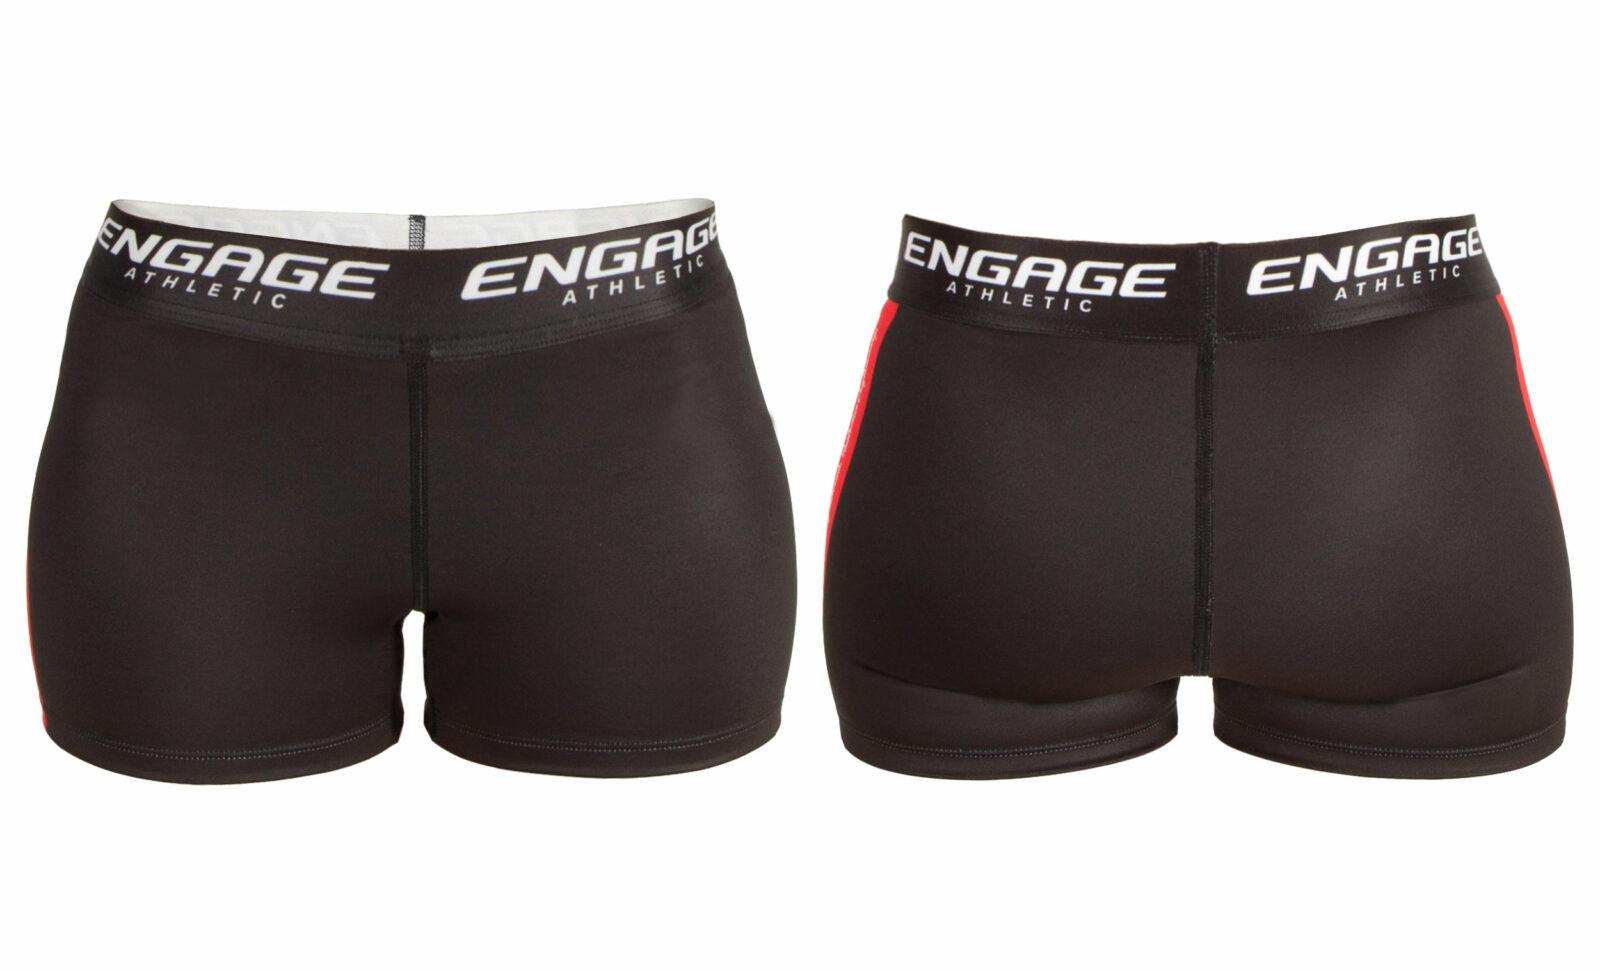 3 inch shorts